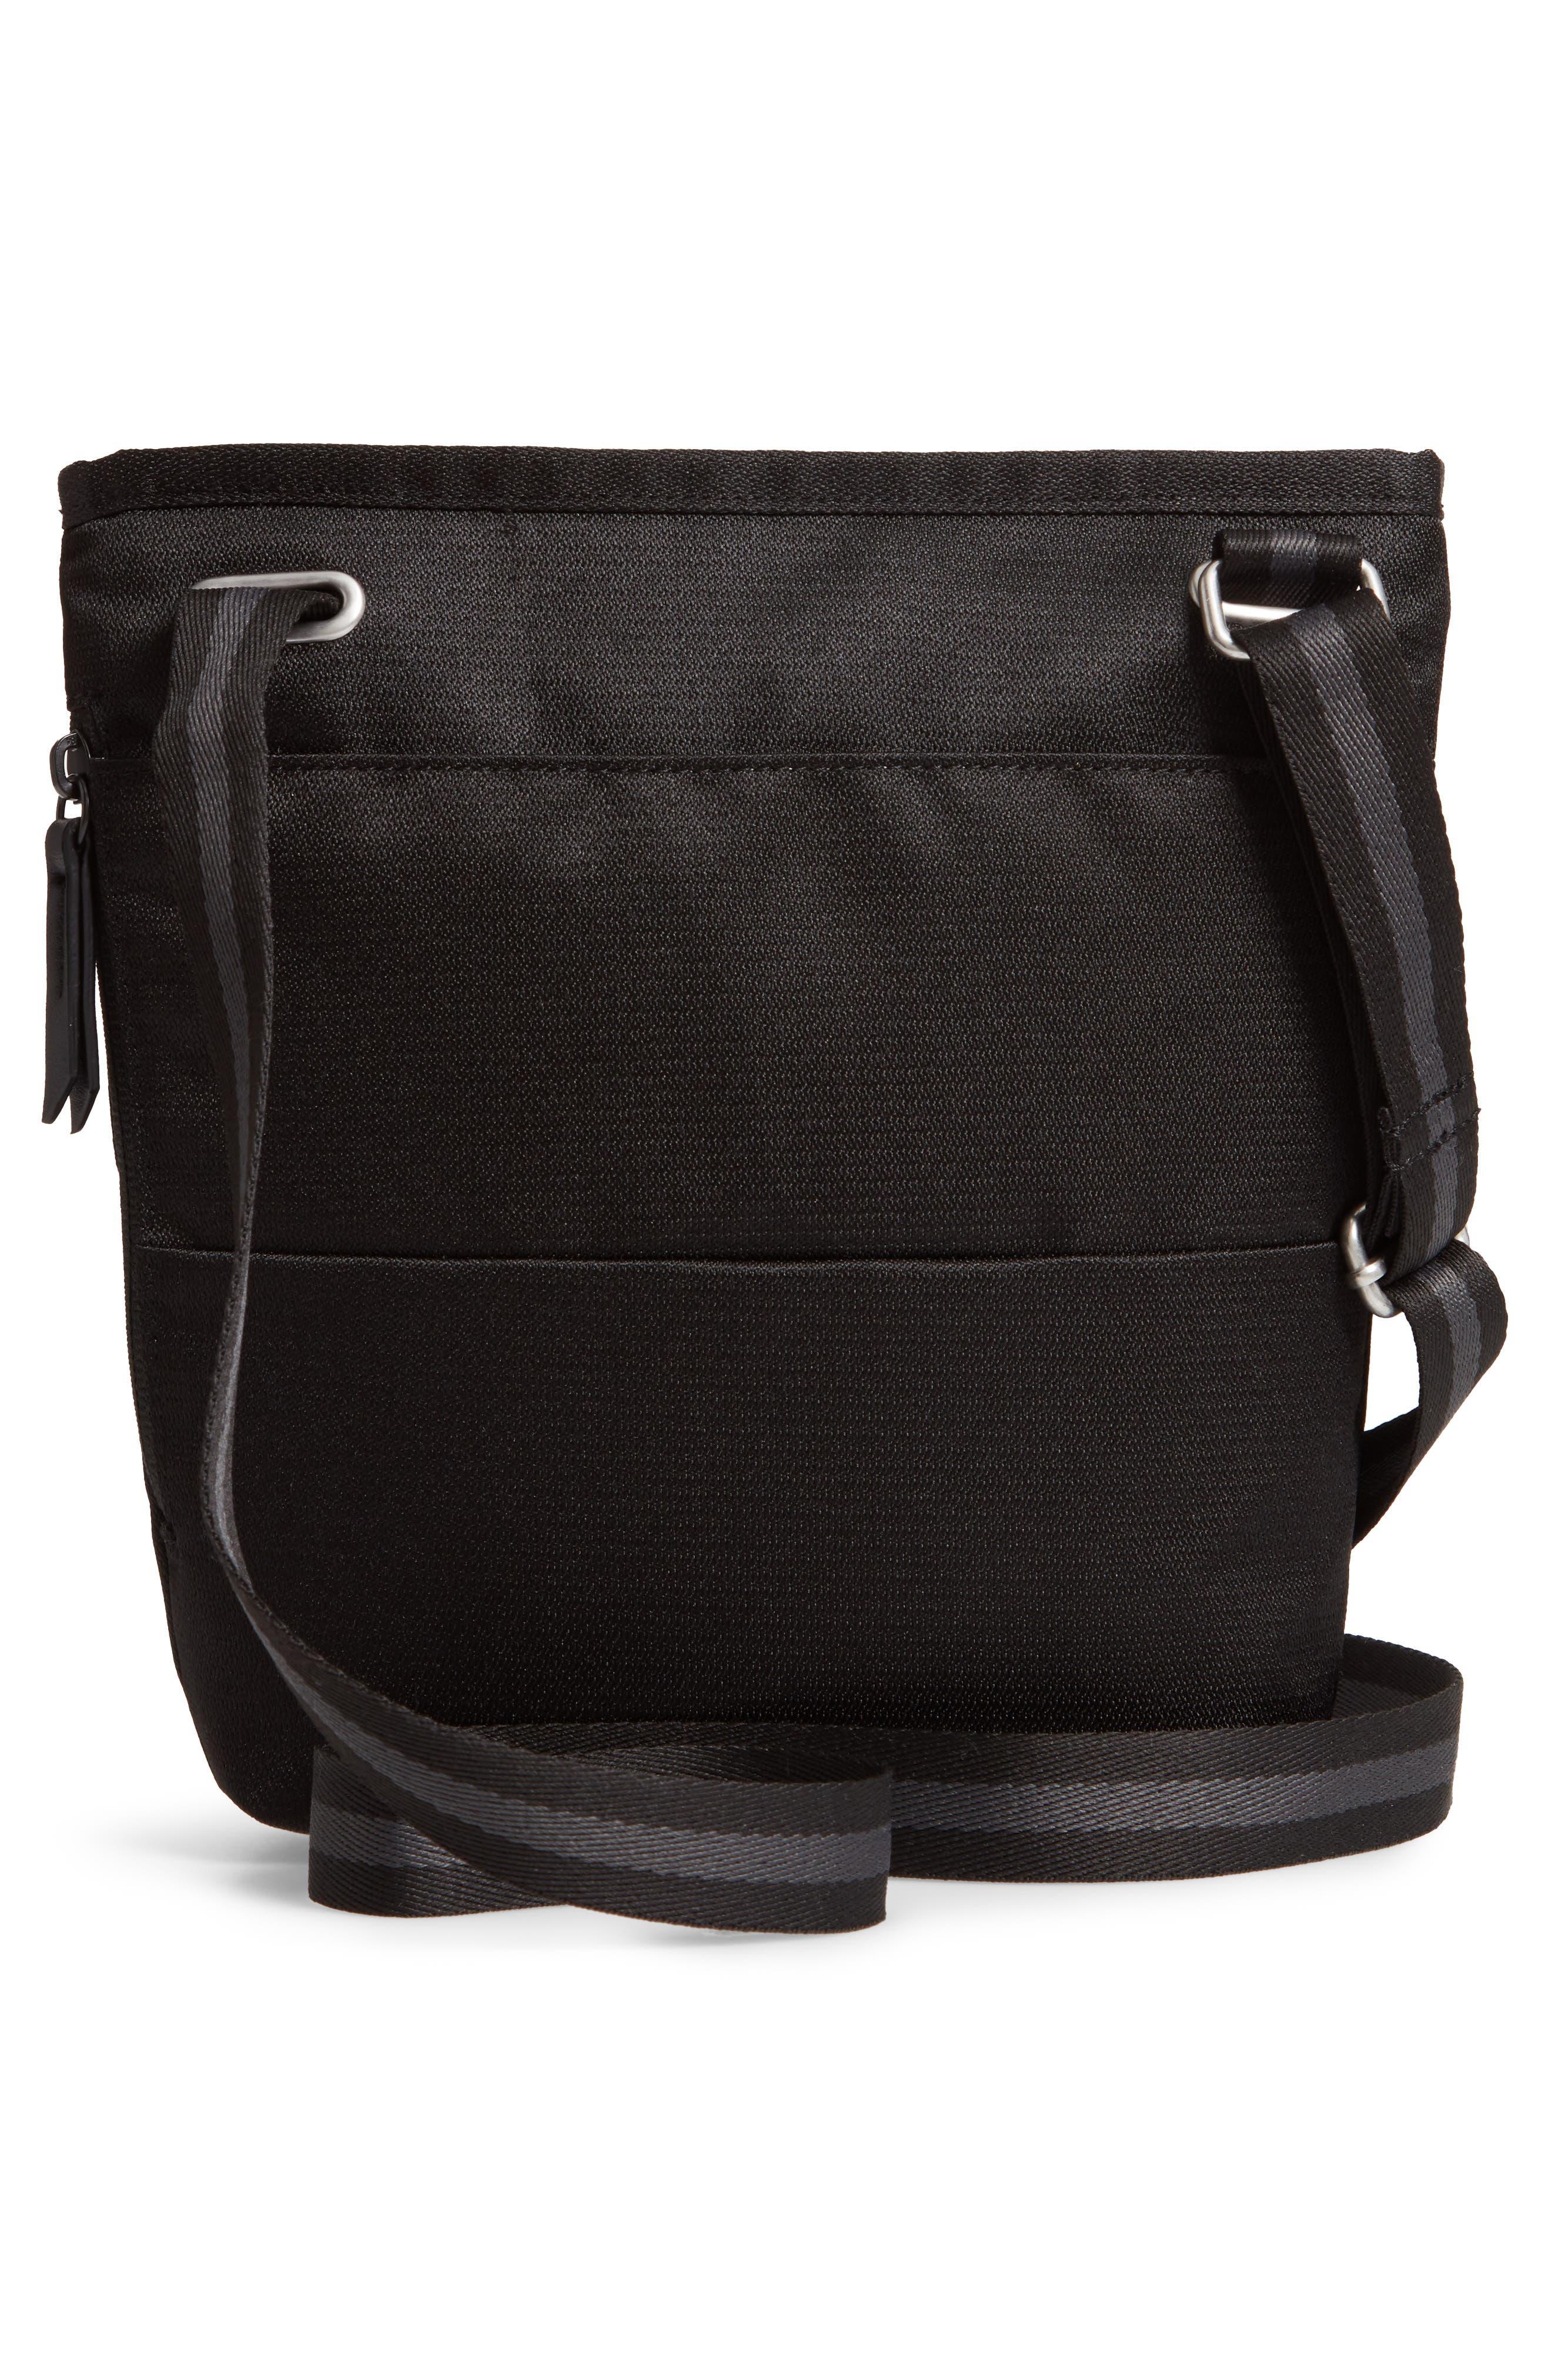 Sadie Medium RFID Crossbody Bag,                             Alternate thumbnail 3, color,                             BLACK/ BLACK